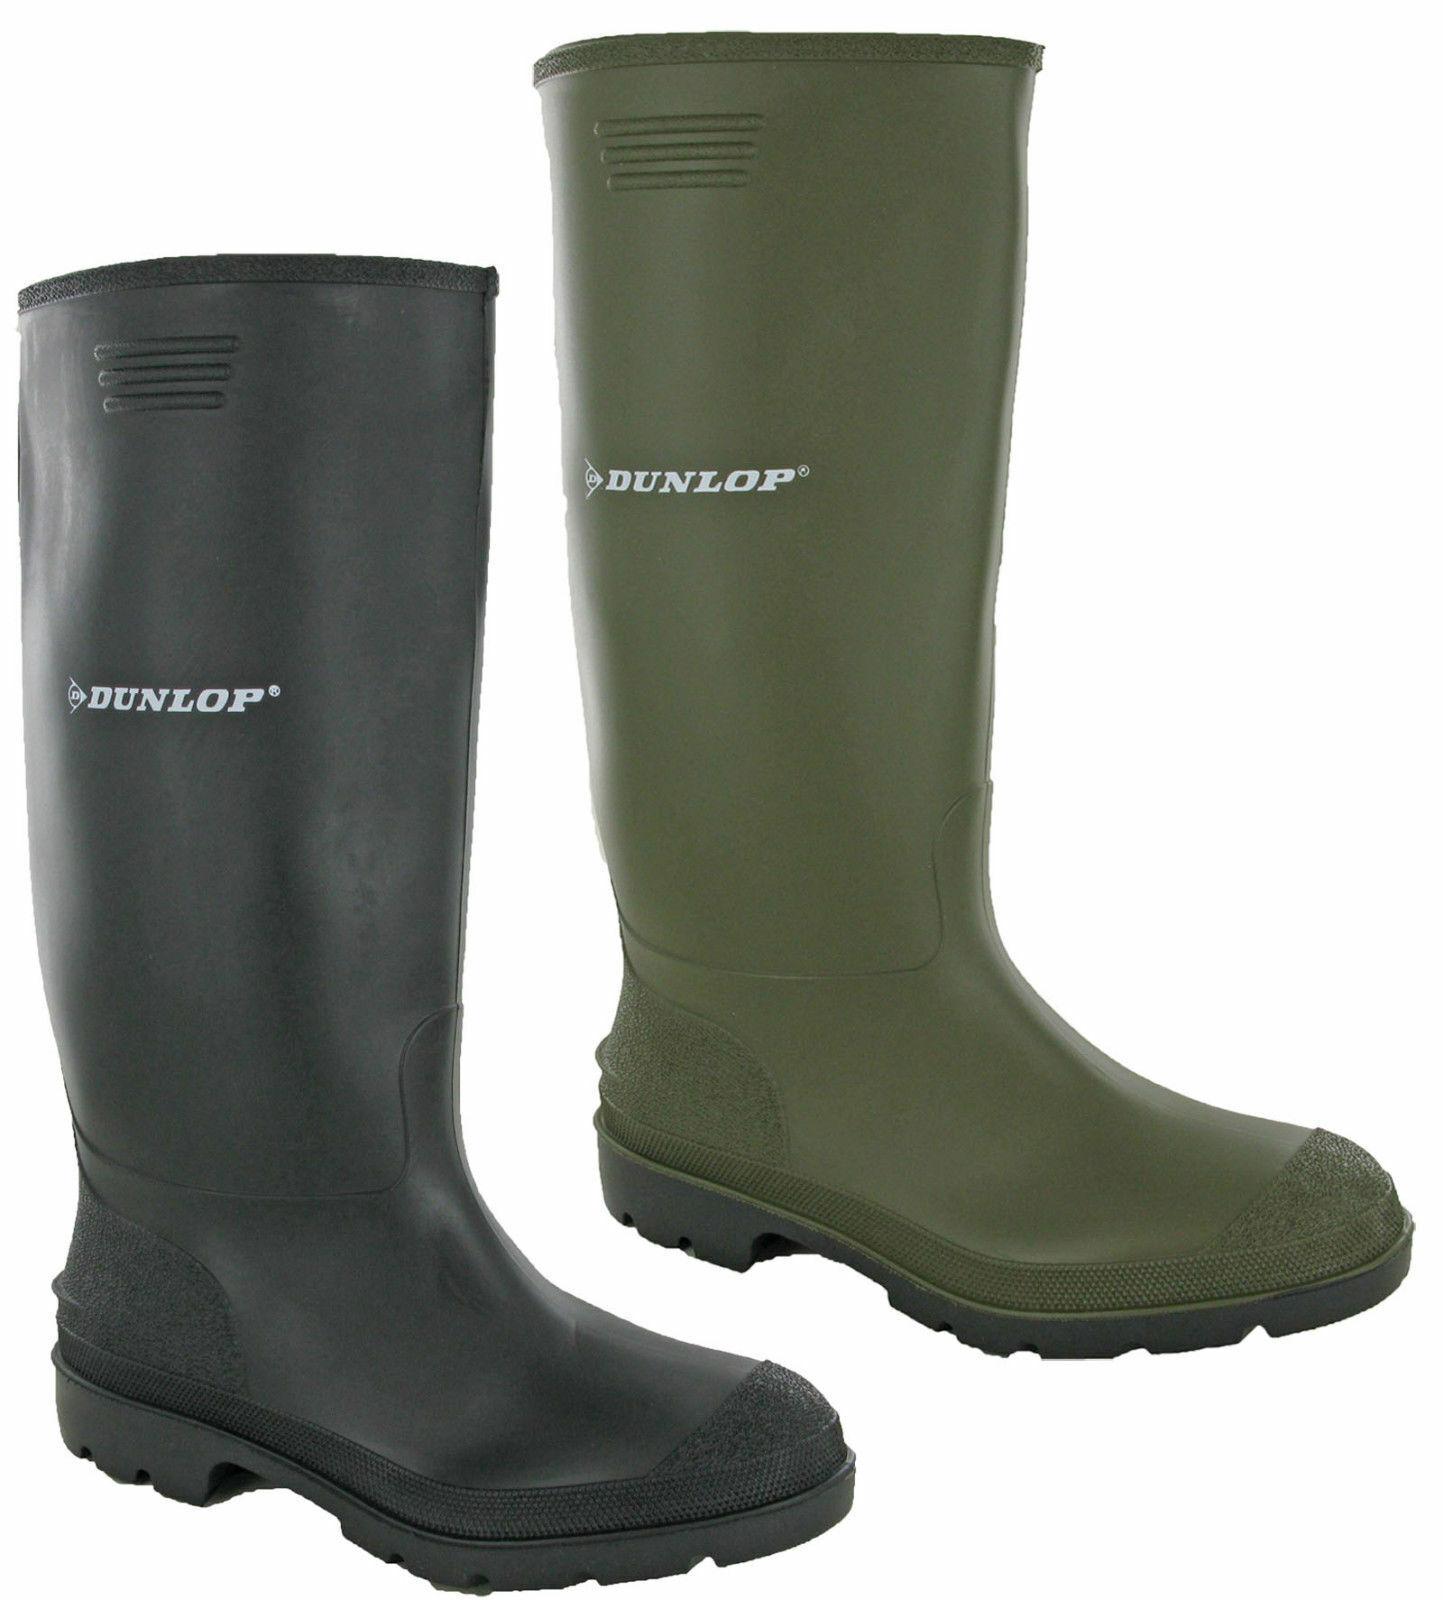 Dunlop Mens Rubber Wellington Boots Pricemastor Wellies Snow Black Green UK 6-12